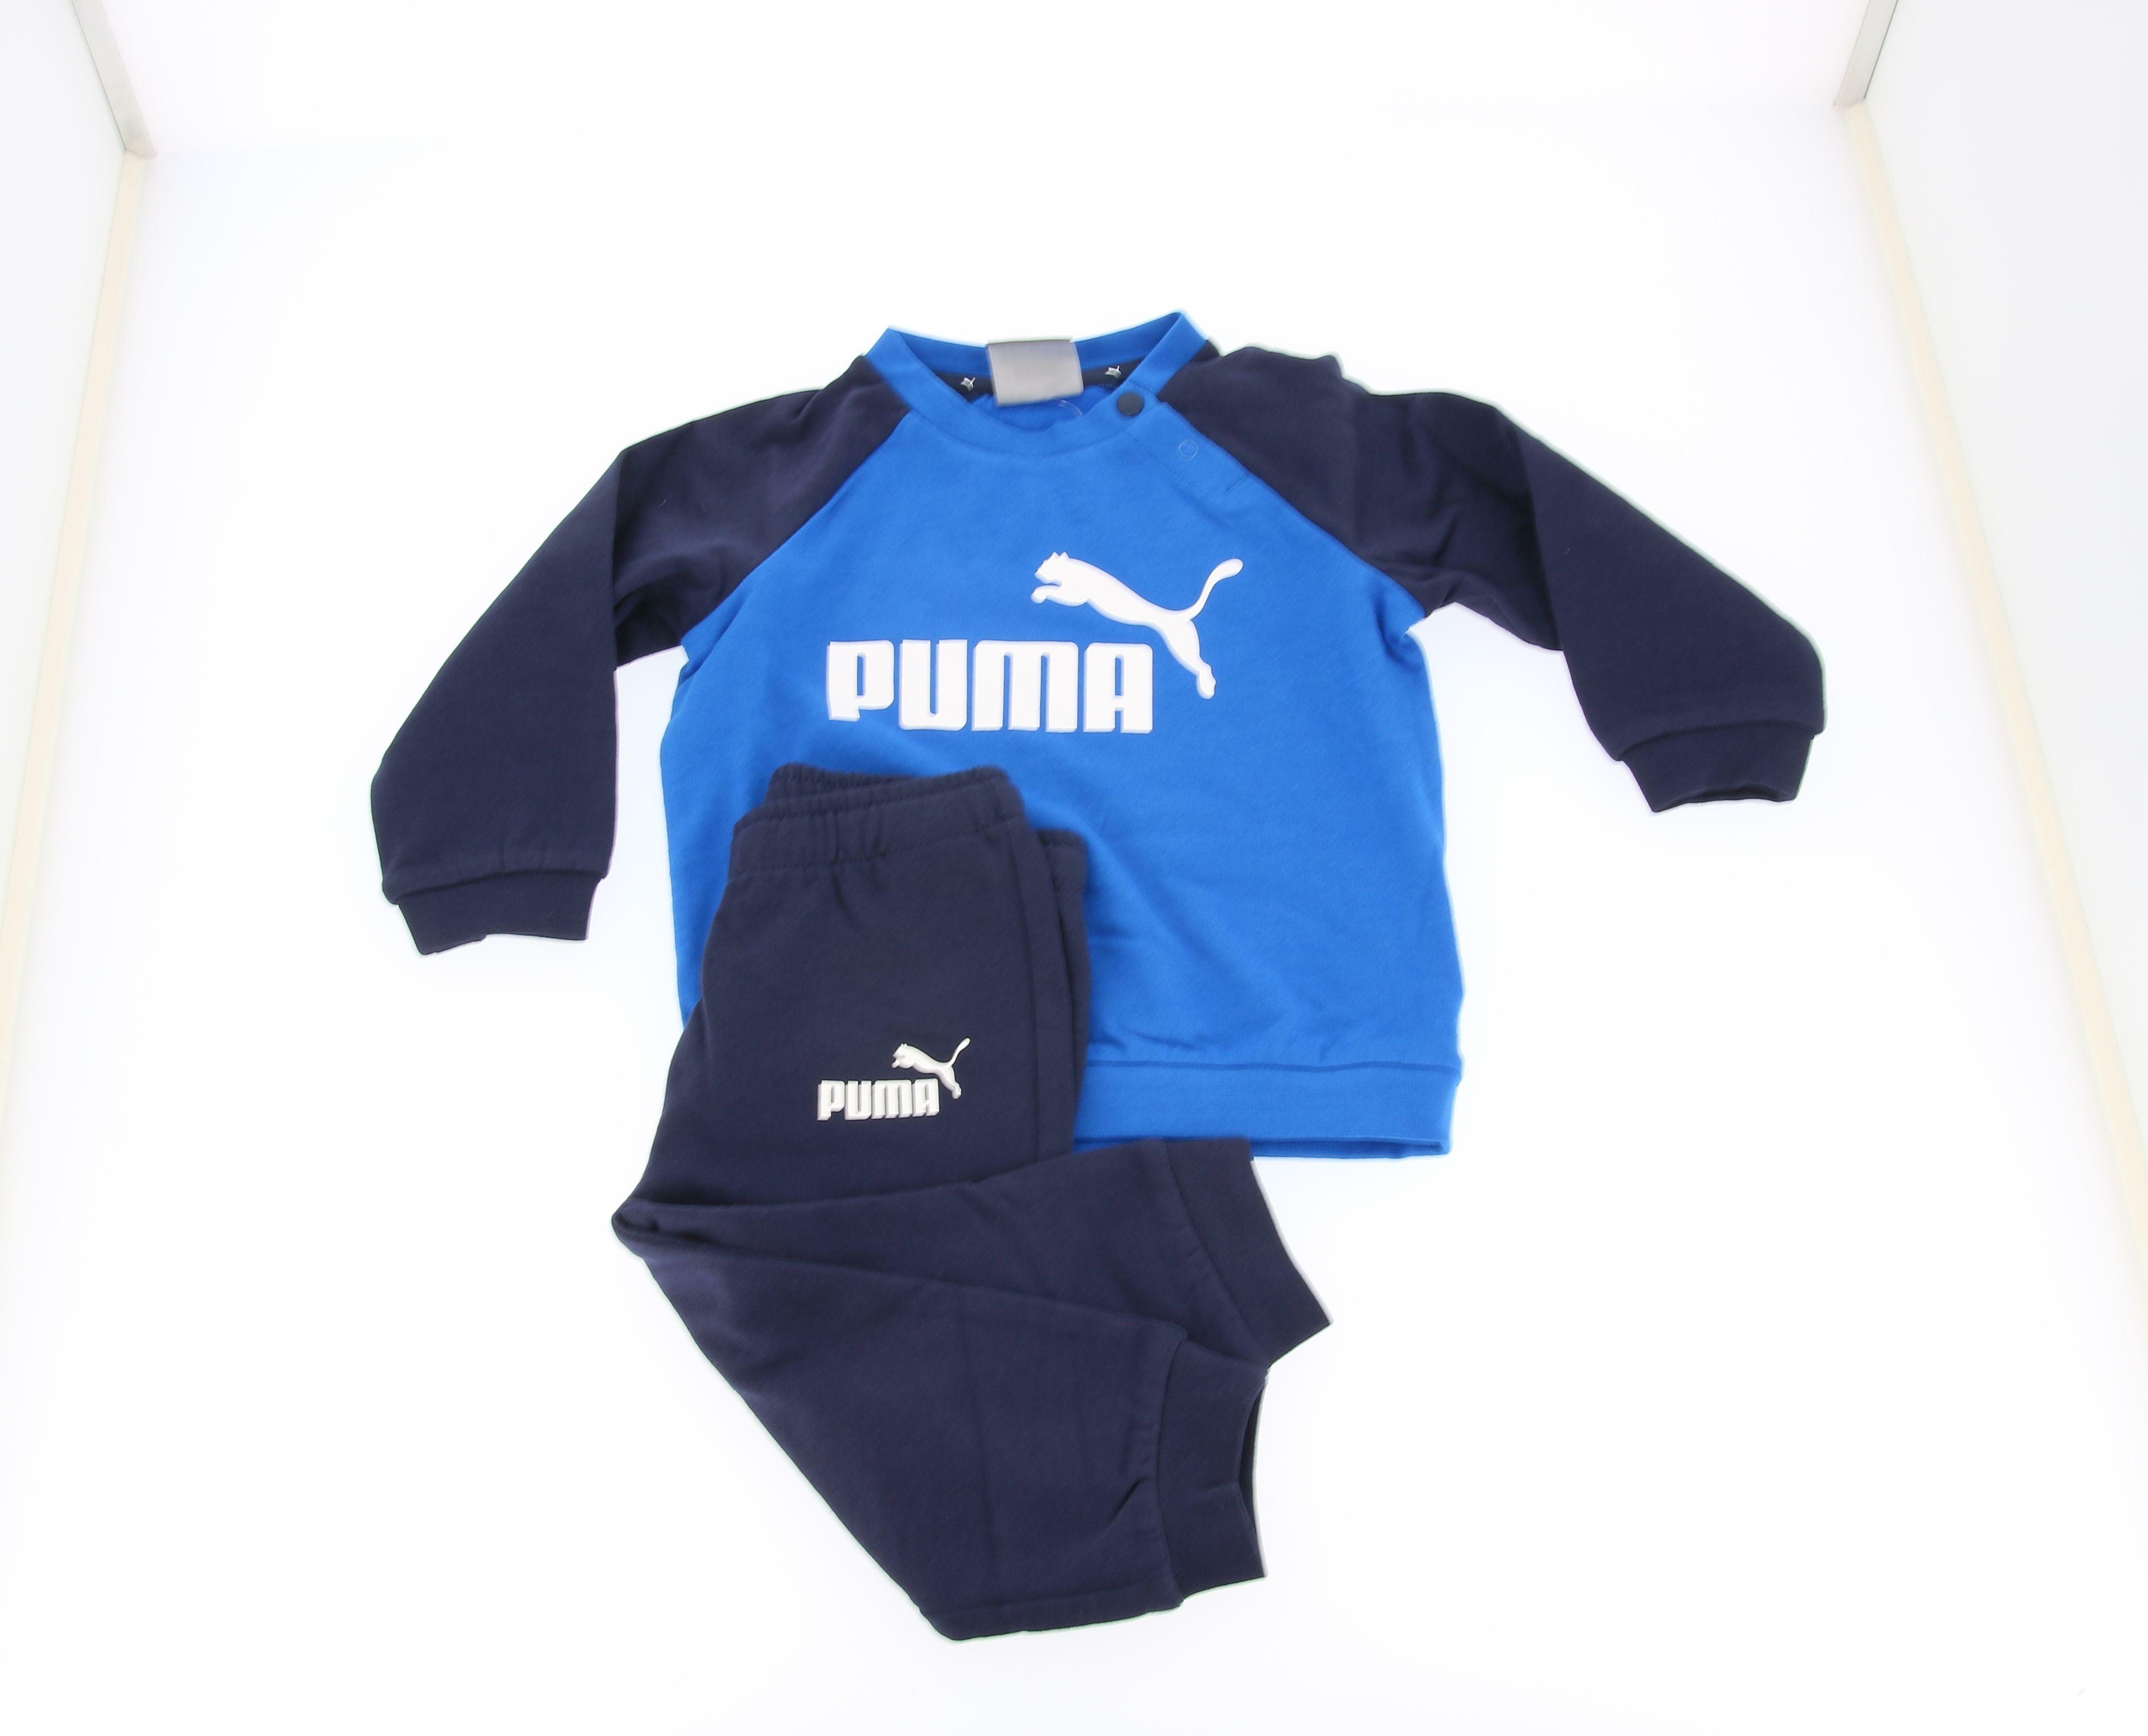 puma puma tuta 584861 006 blu tuta completa bambino